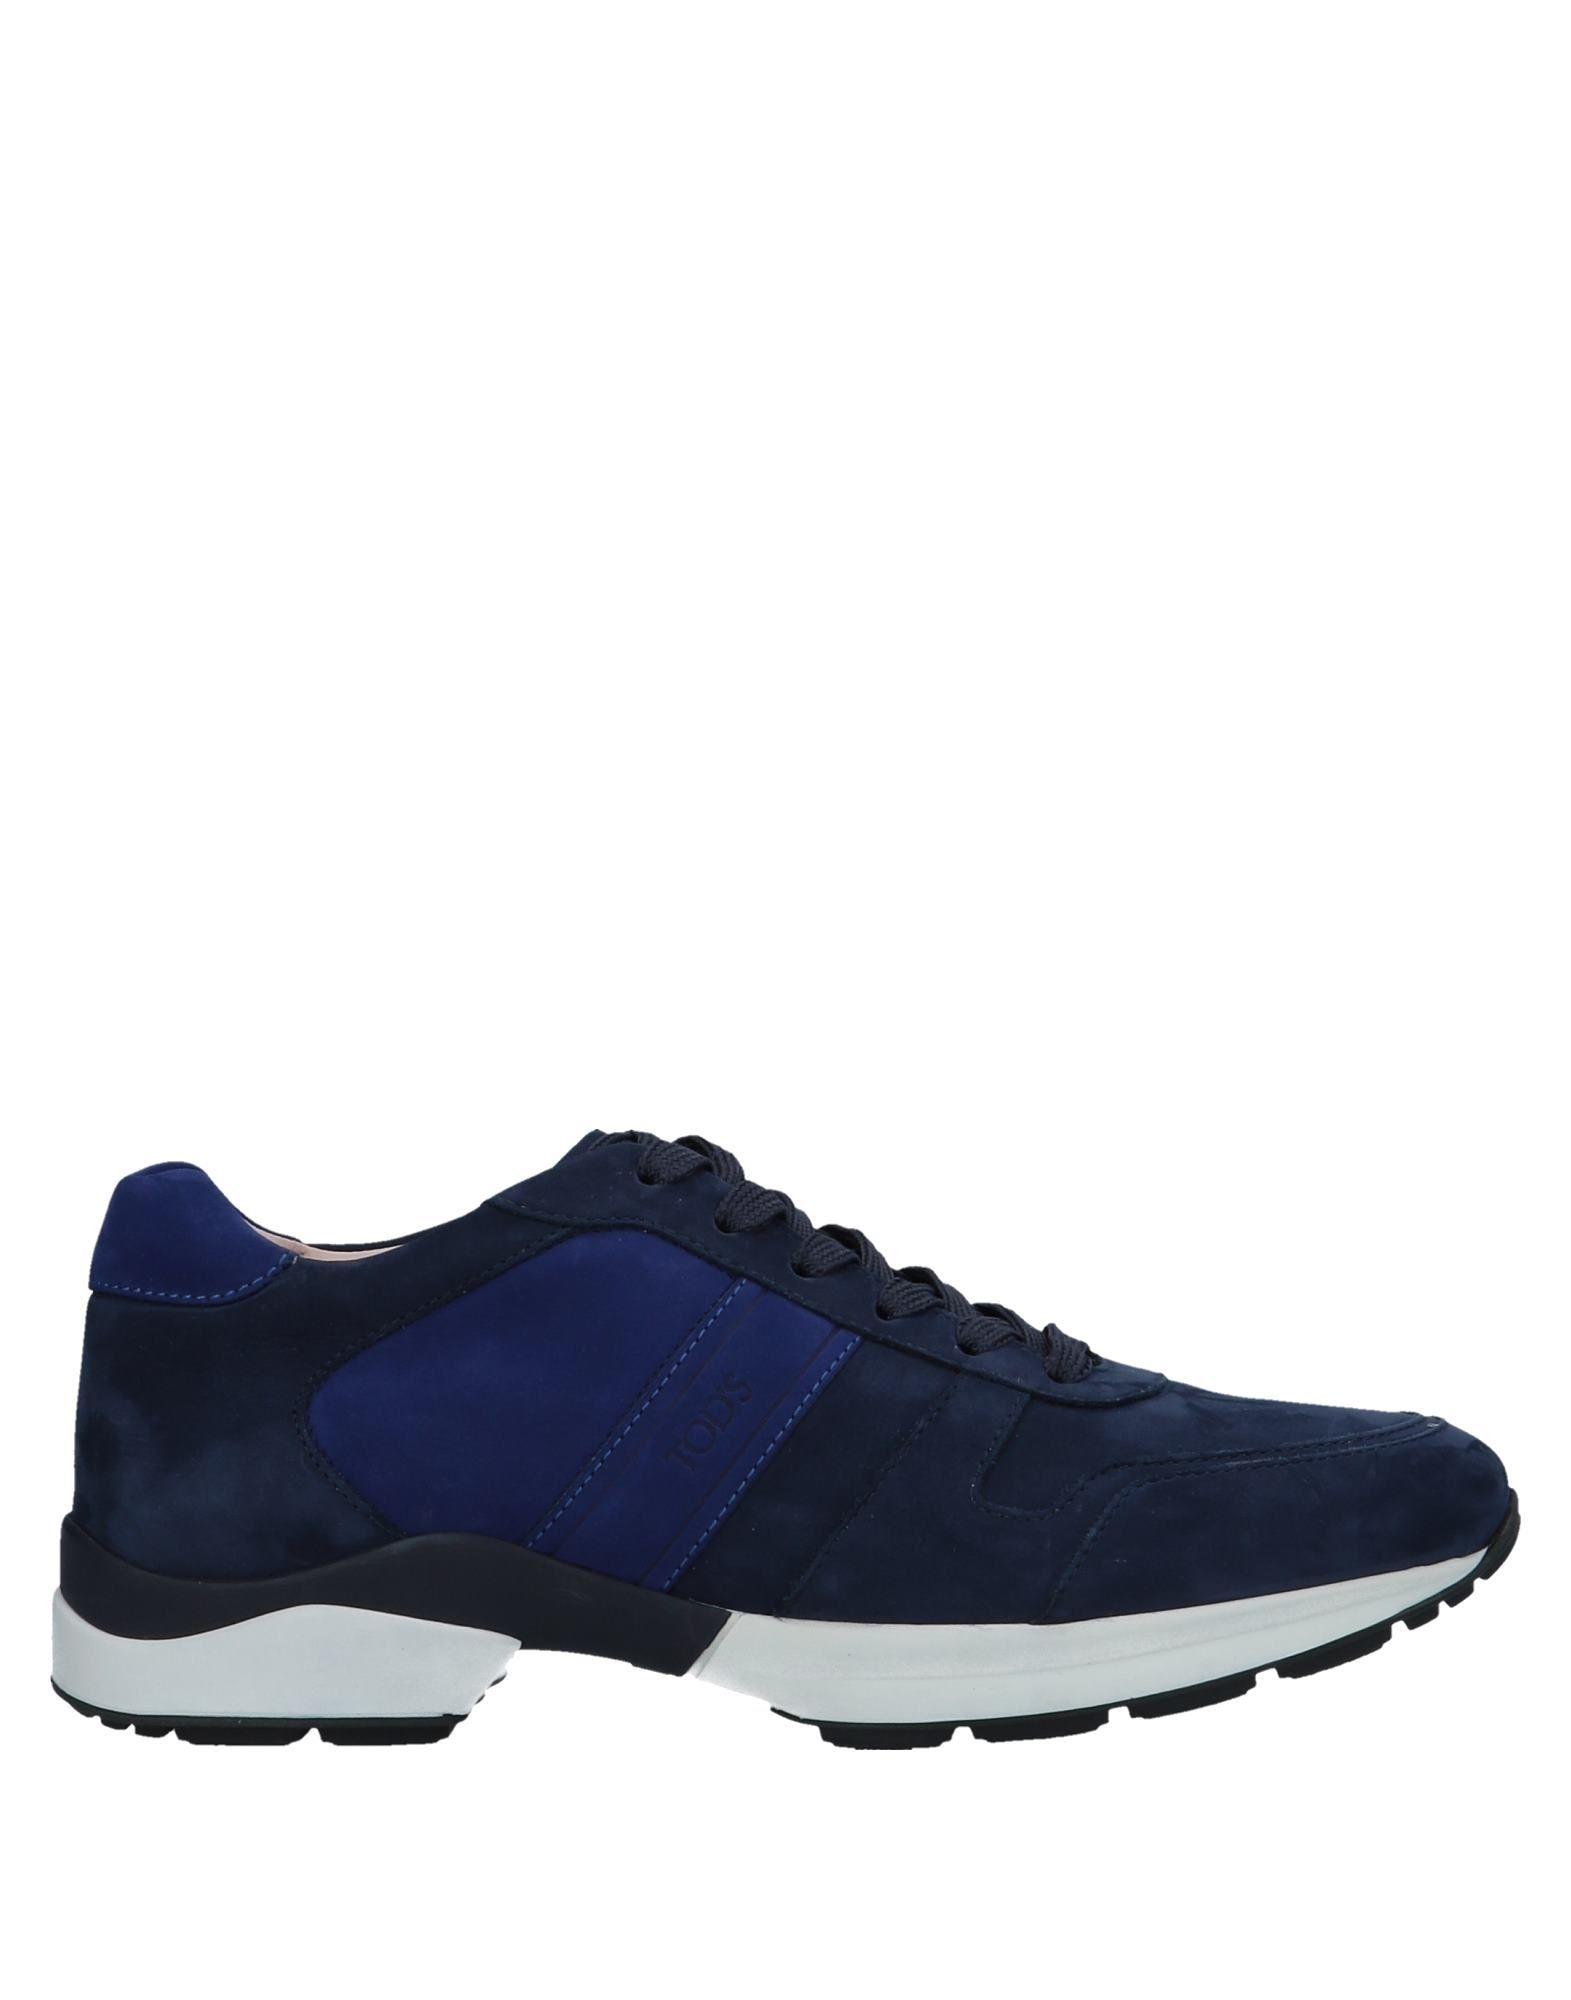 Haltbare Mode billige Schuhe Tod's Sneakers Damen  11542112MQ Heiße Schuhe